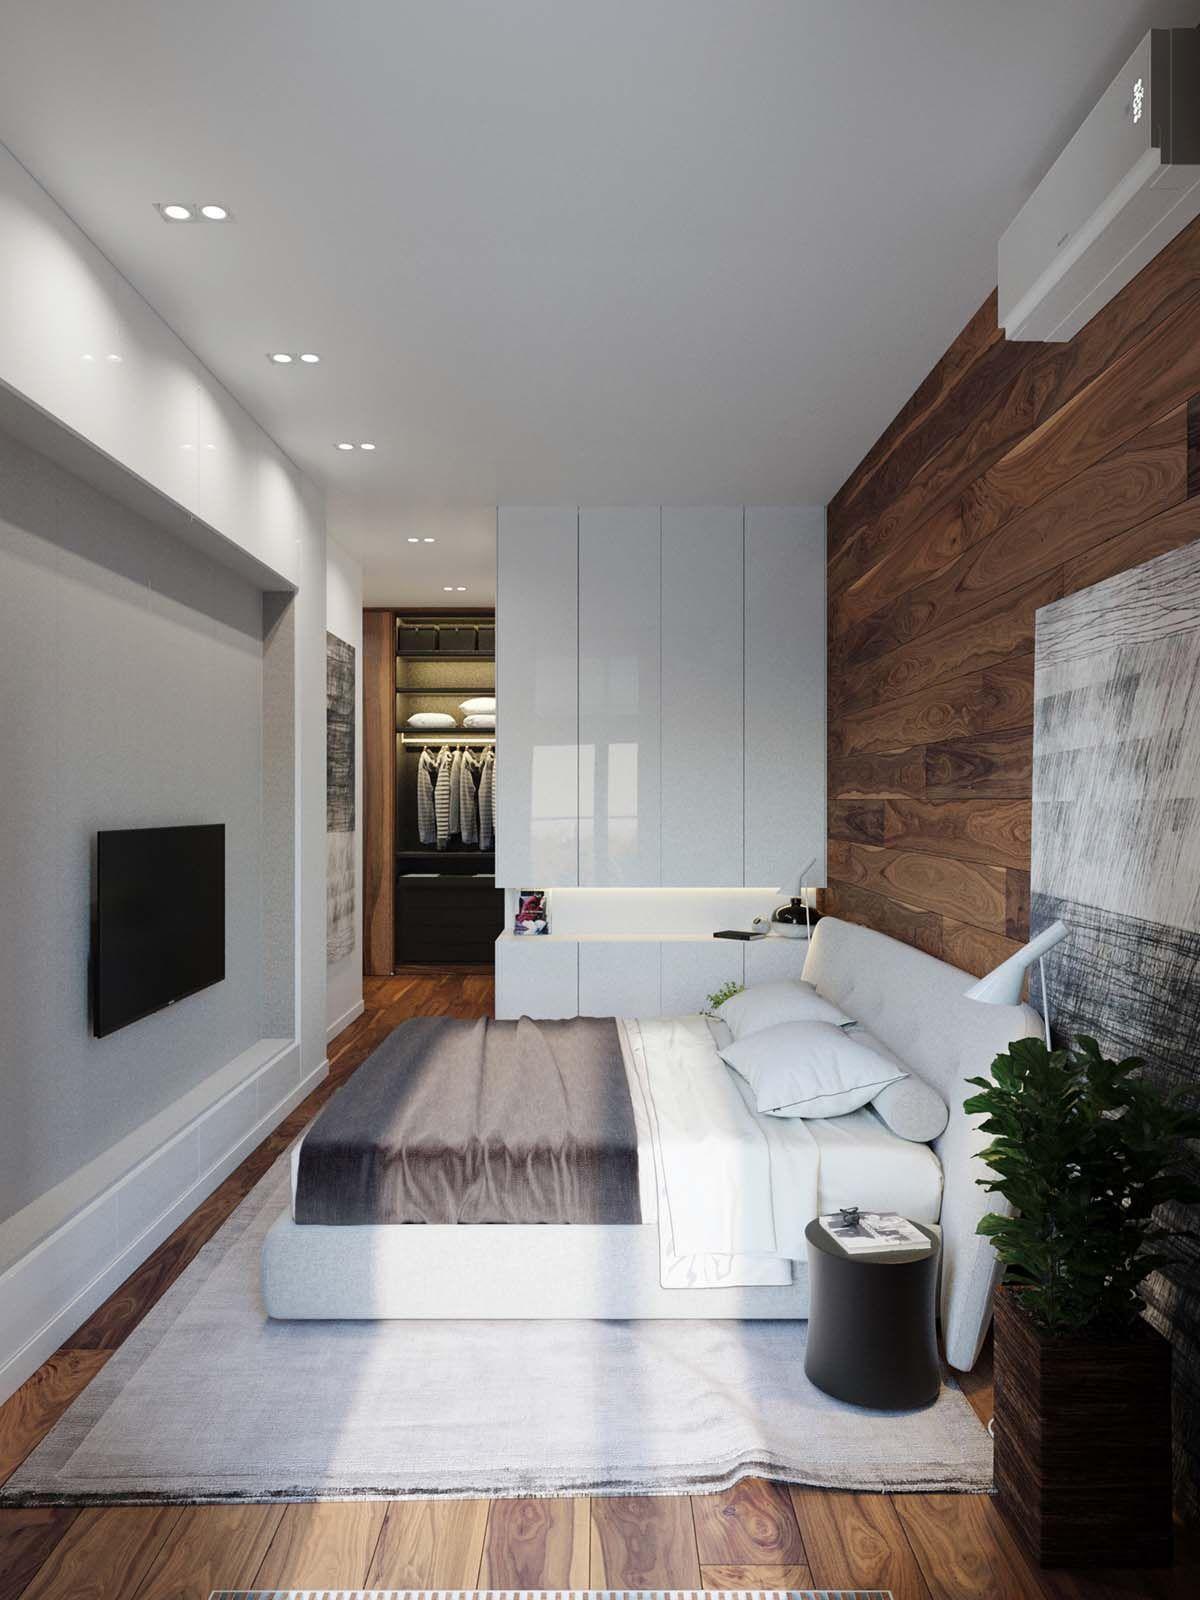 Https://unscripted360.com/bedroom Design Ideas/ Unique Bedroom Decorating  Ideas | Extremely Unique Bedroom Design | Unique Bedroom Ideas For Small  Rooms ...